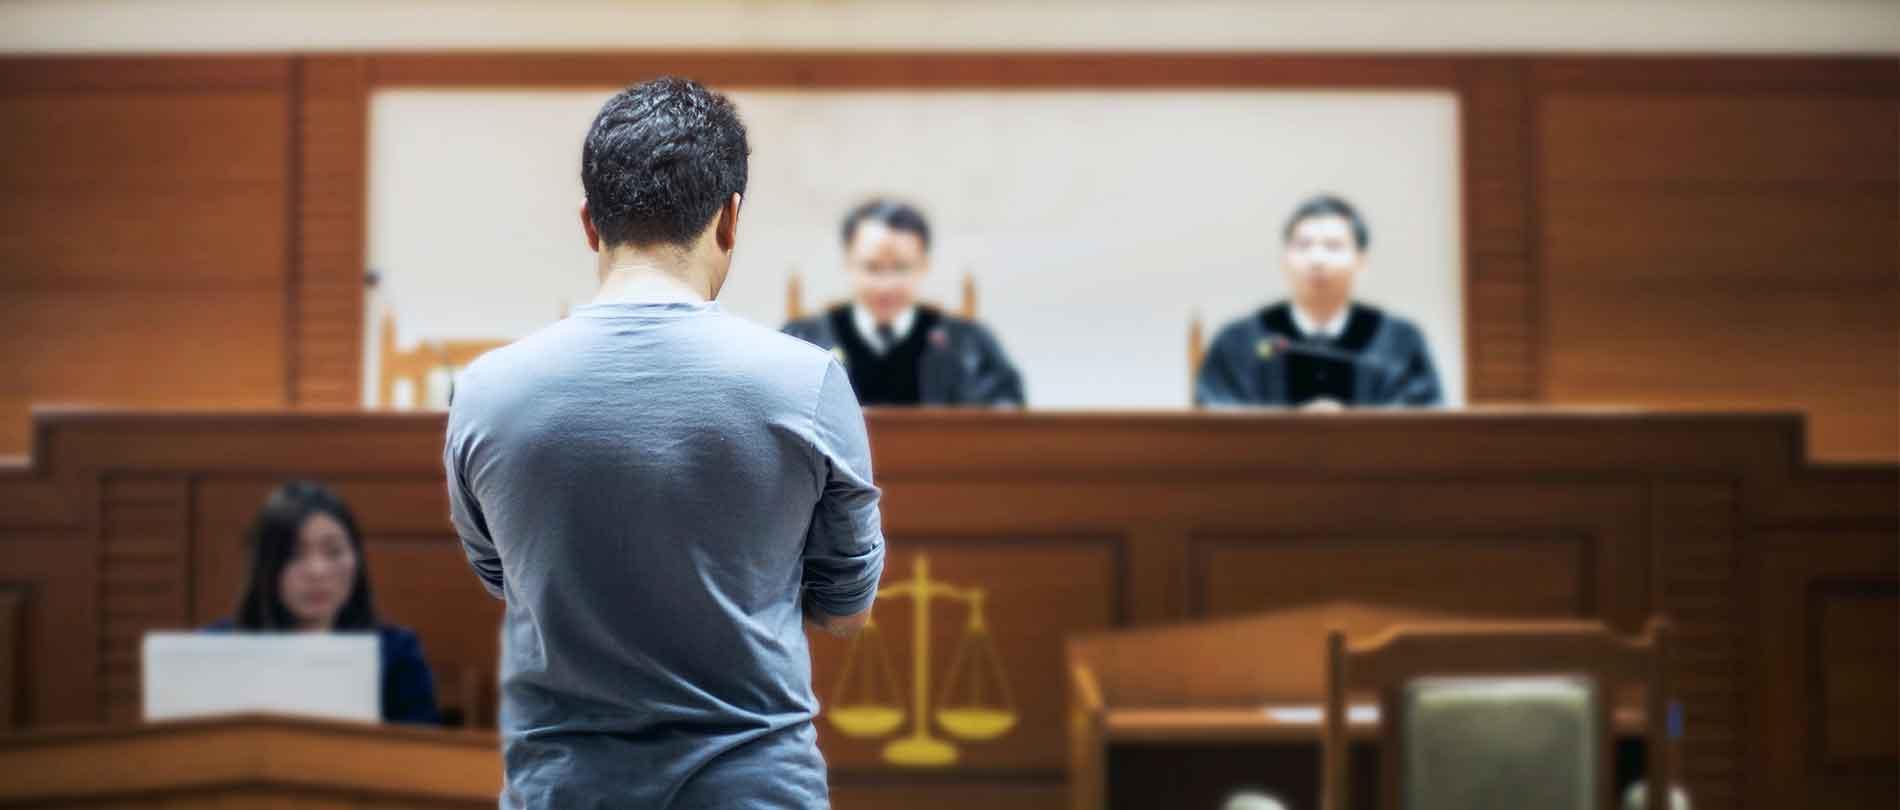 DUI offenses